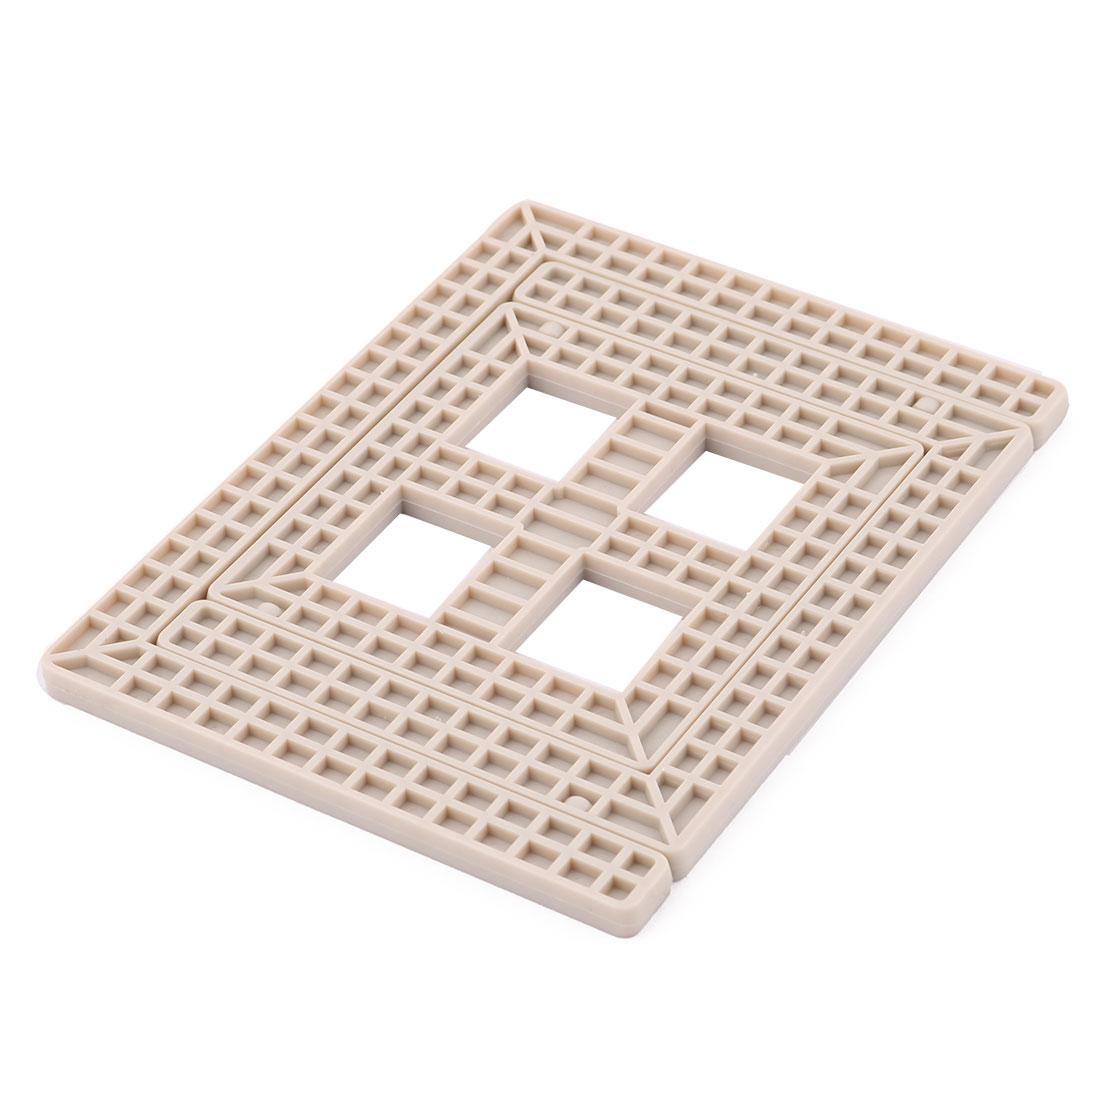 Home Kitchenware Plastic Foldable Expandable Heat Resistant Hot Pot Dish Bowl Holder Insulation Mat Khaki